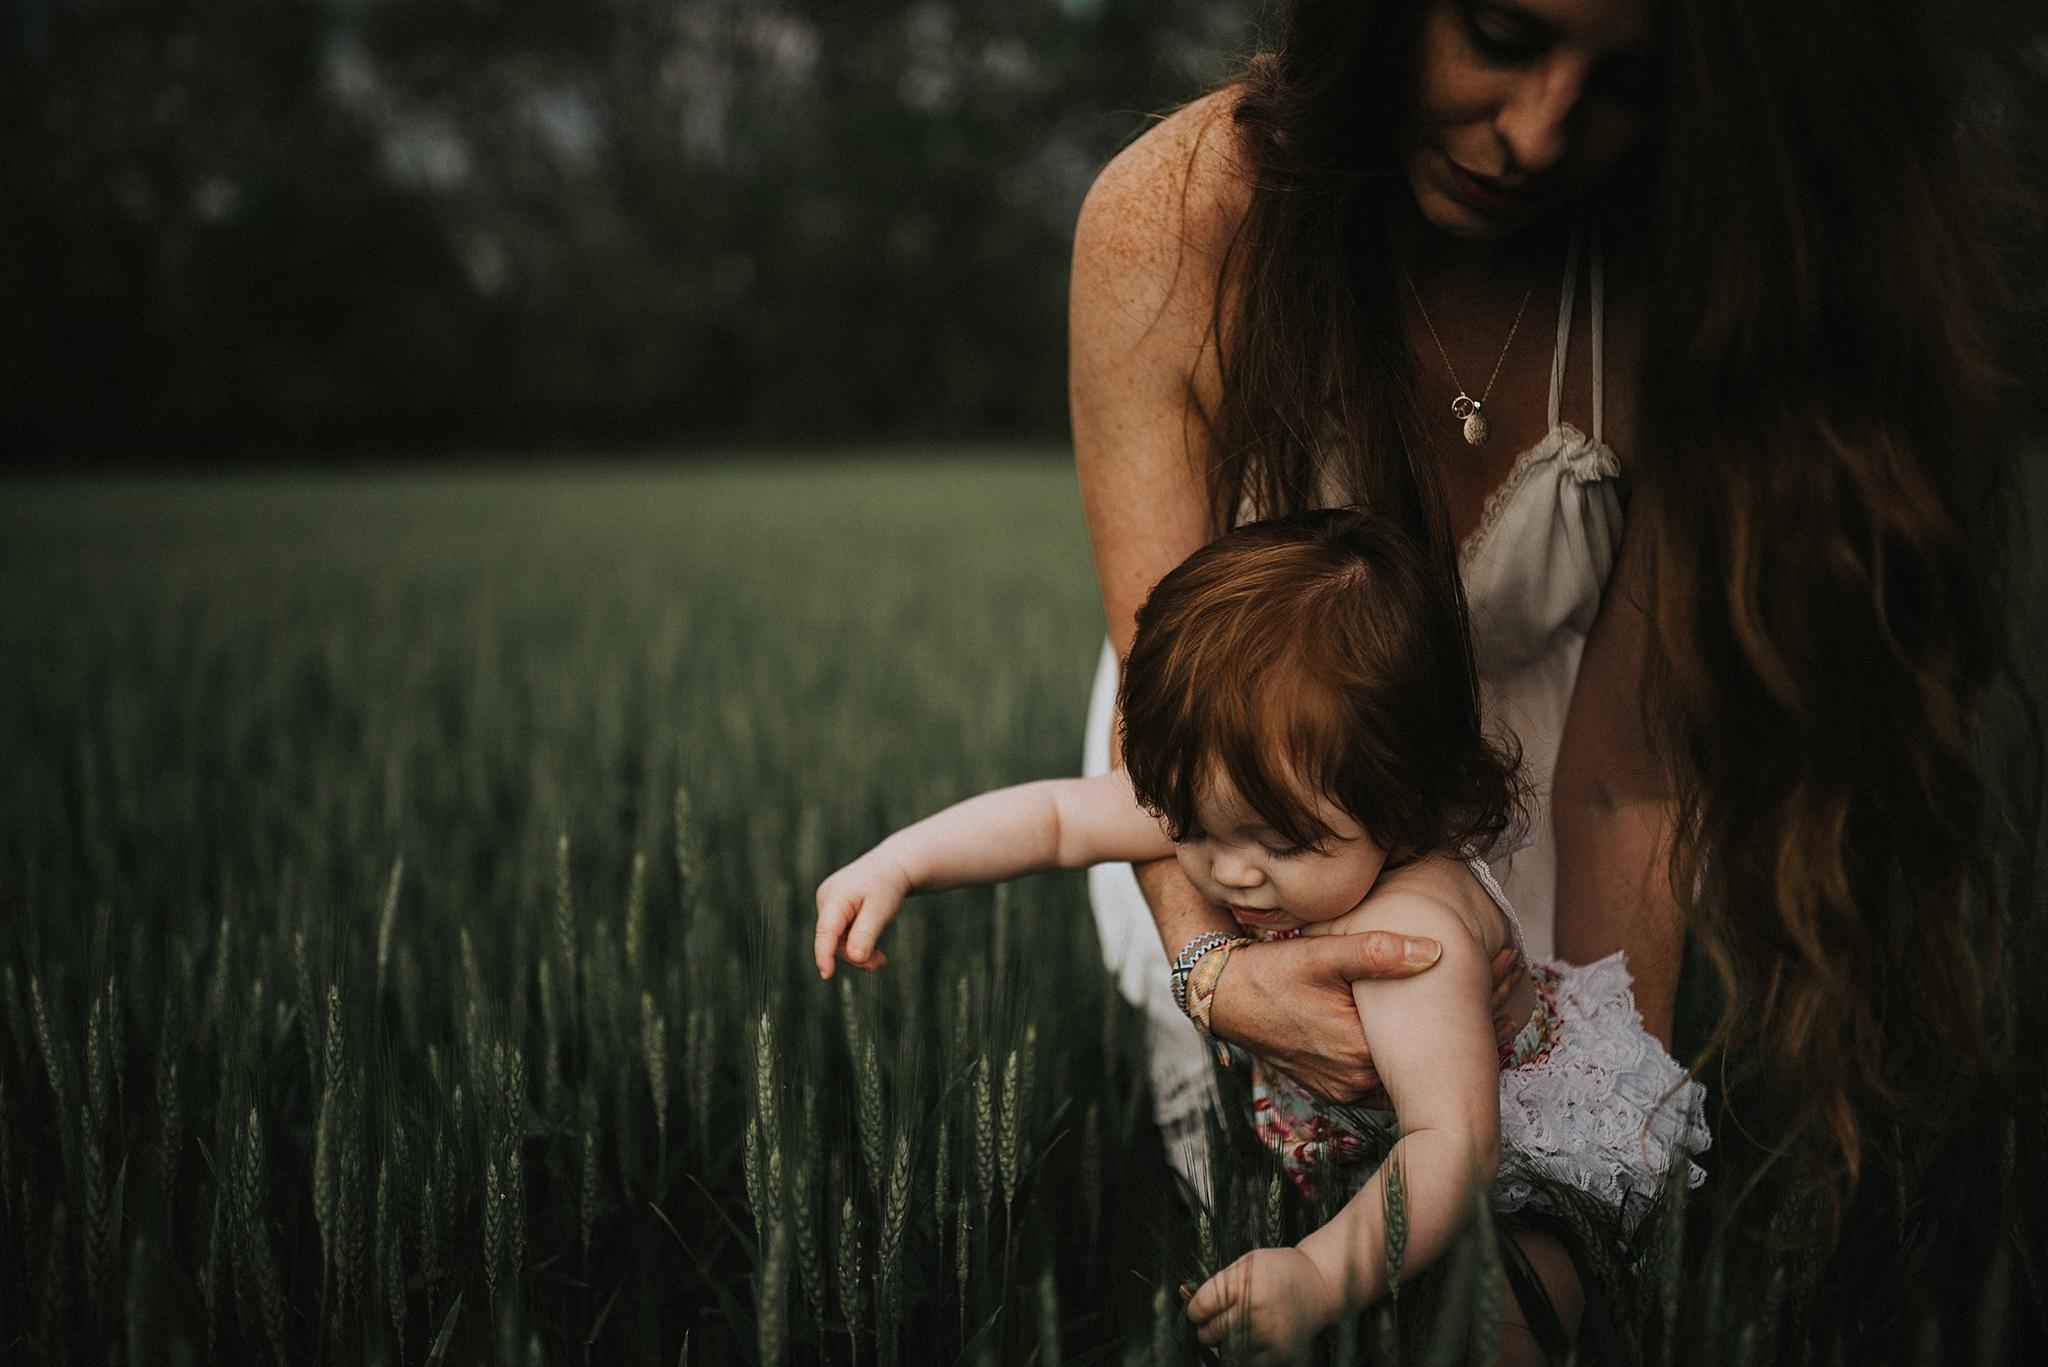 twyla jones photography - mother daughter - field and forest-4412_treasure coast florida.jpg